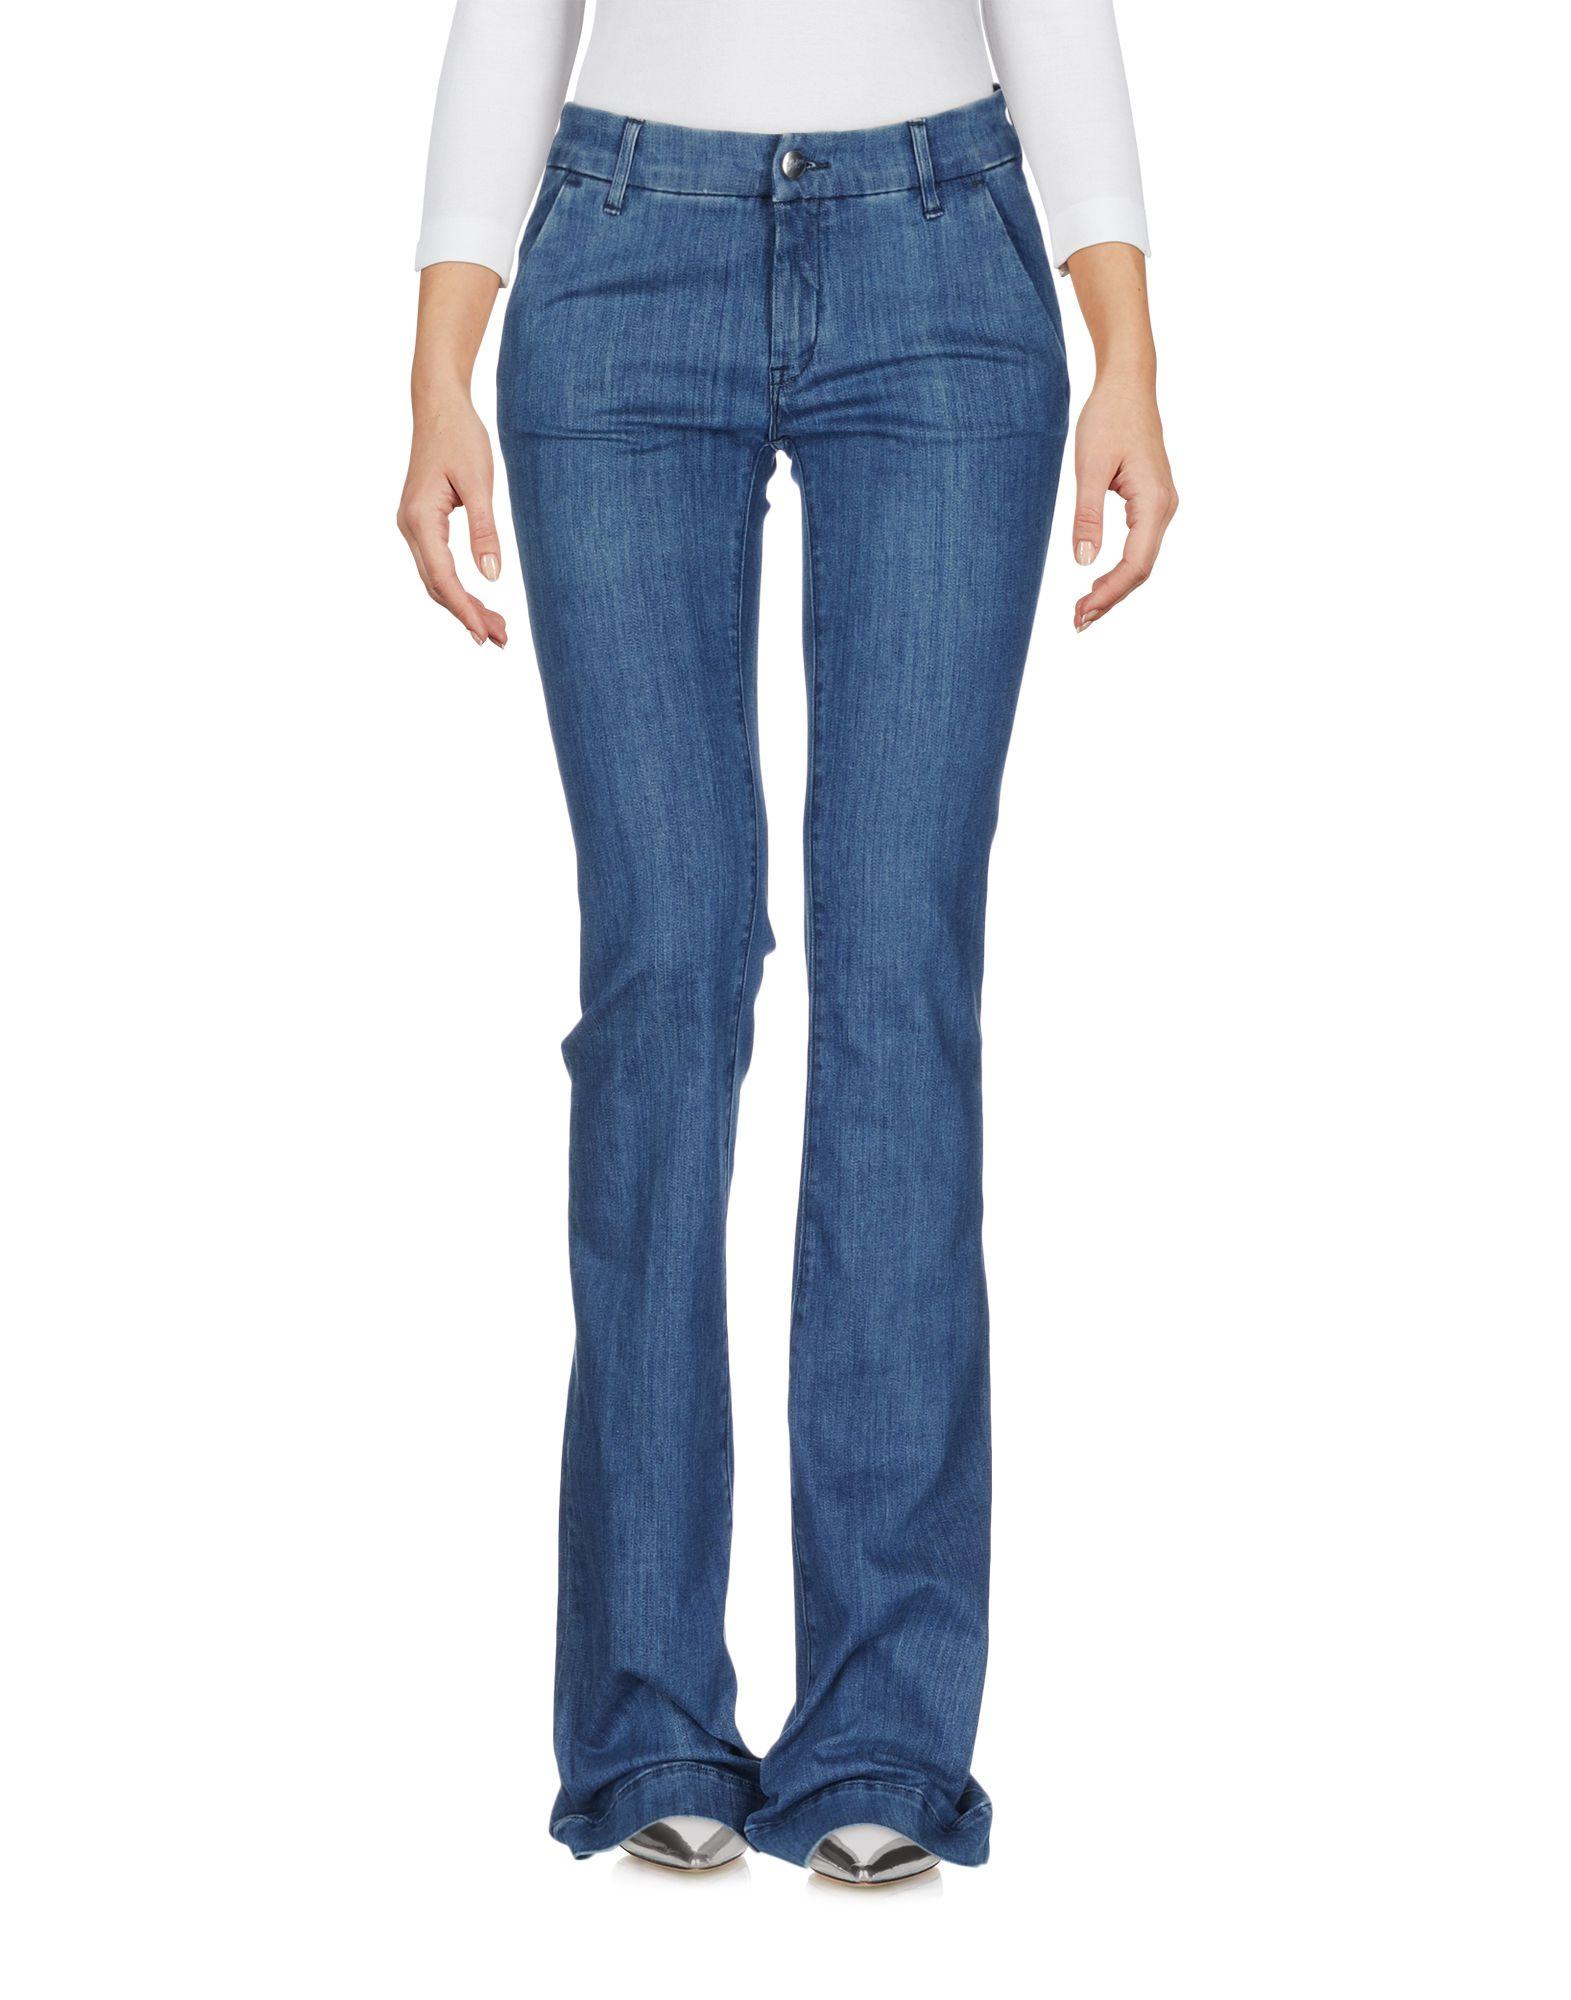 Acquista The Pantaloni su Jeans Seafarer online YOOX Donna fPBITBq 7a722605335